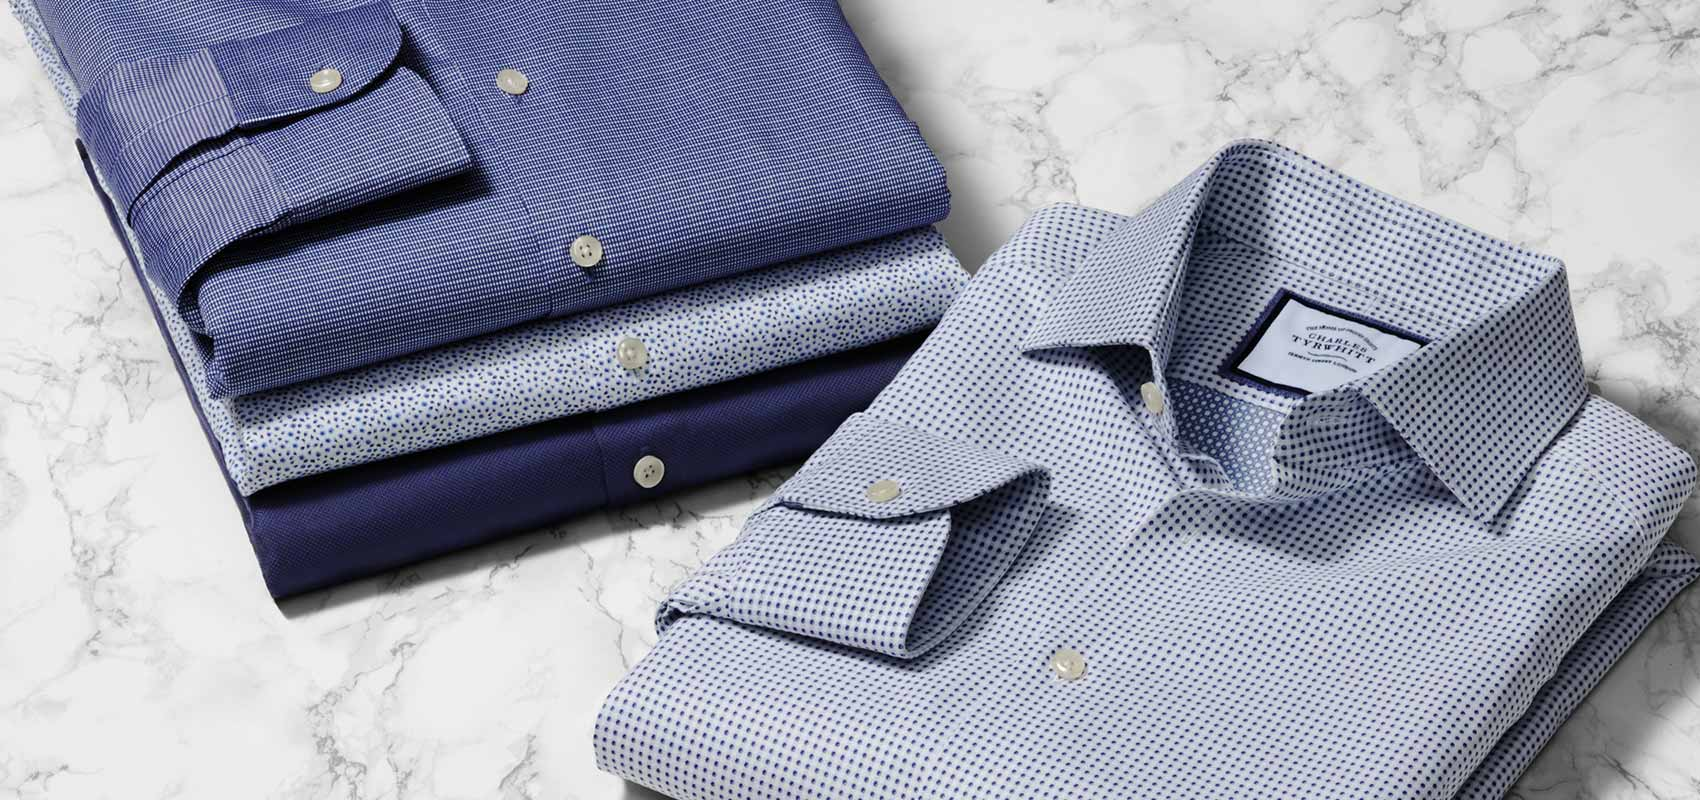 Charles Tyrwhitt blue shirt collection